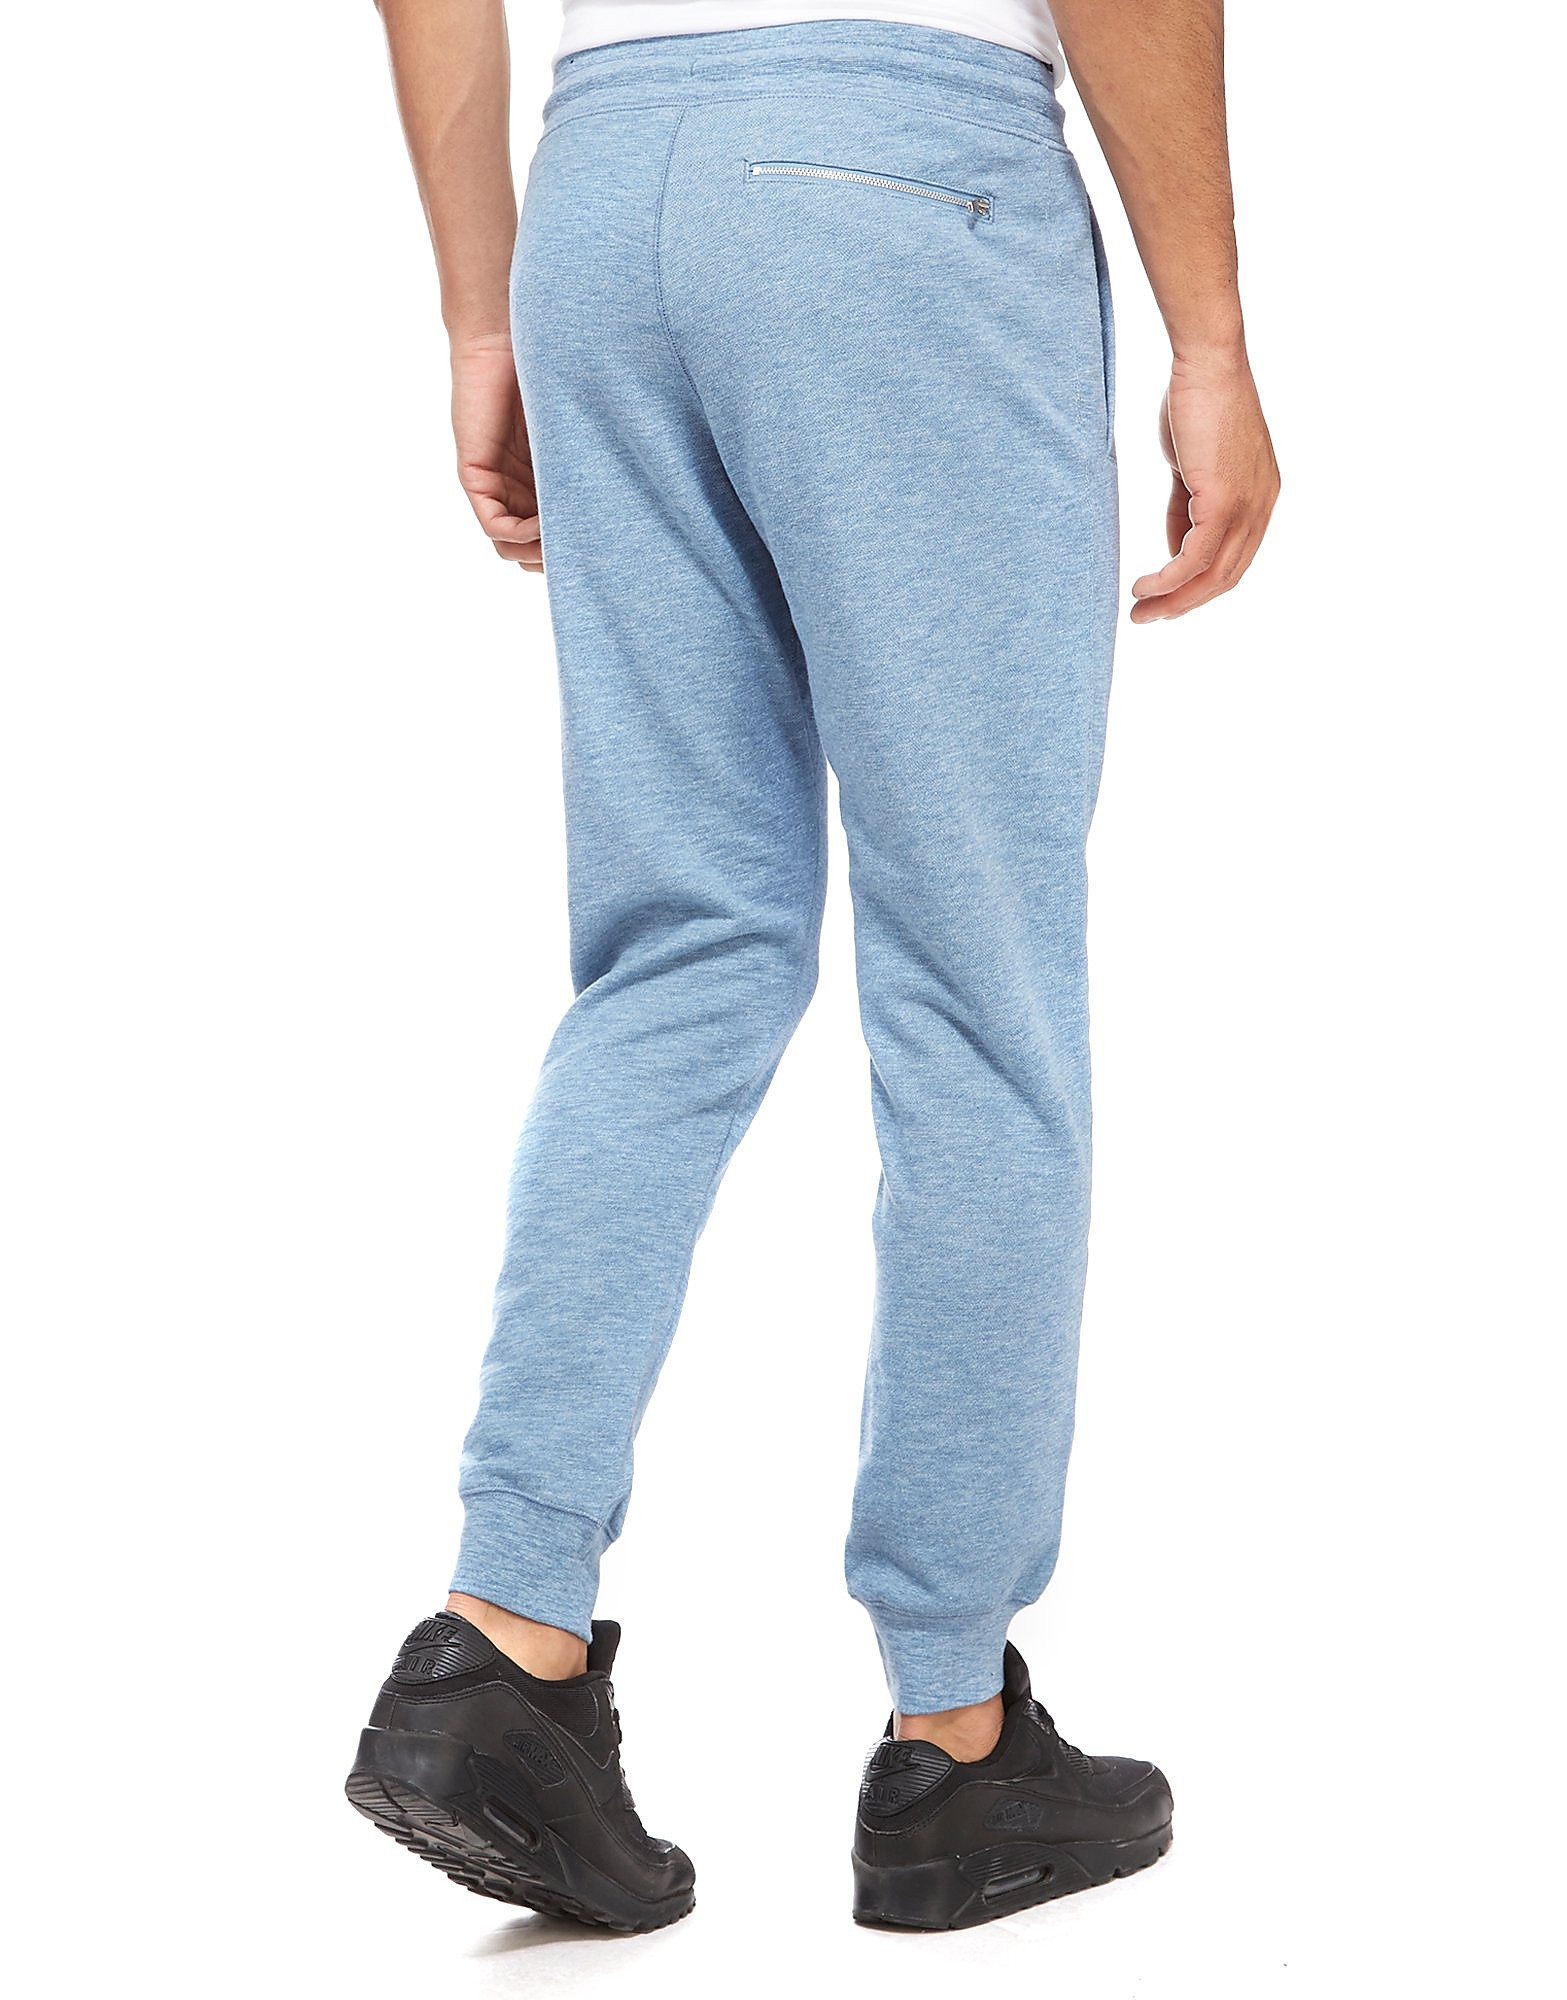 Nike Legacy Jogging Pants